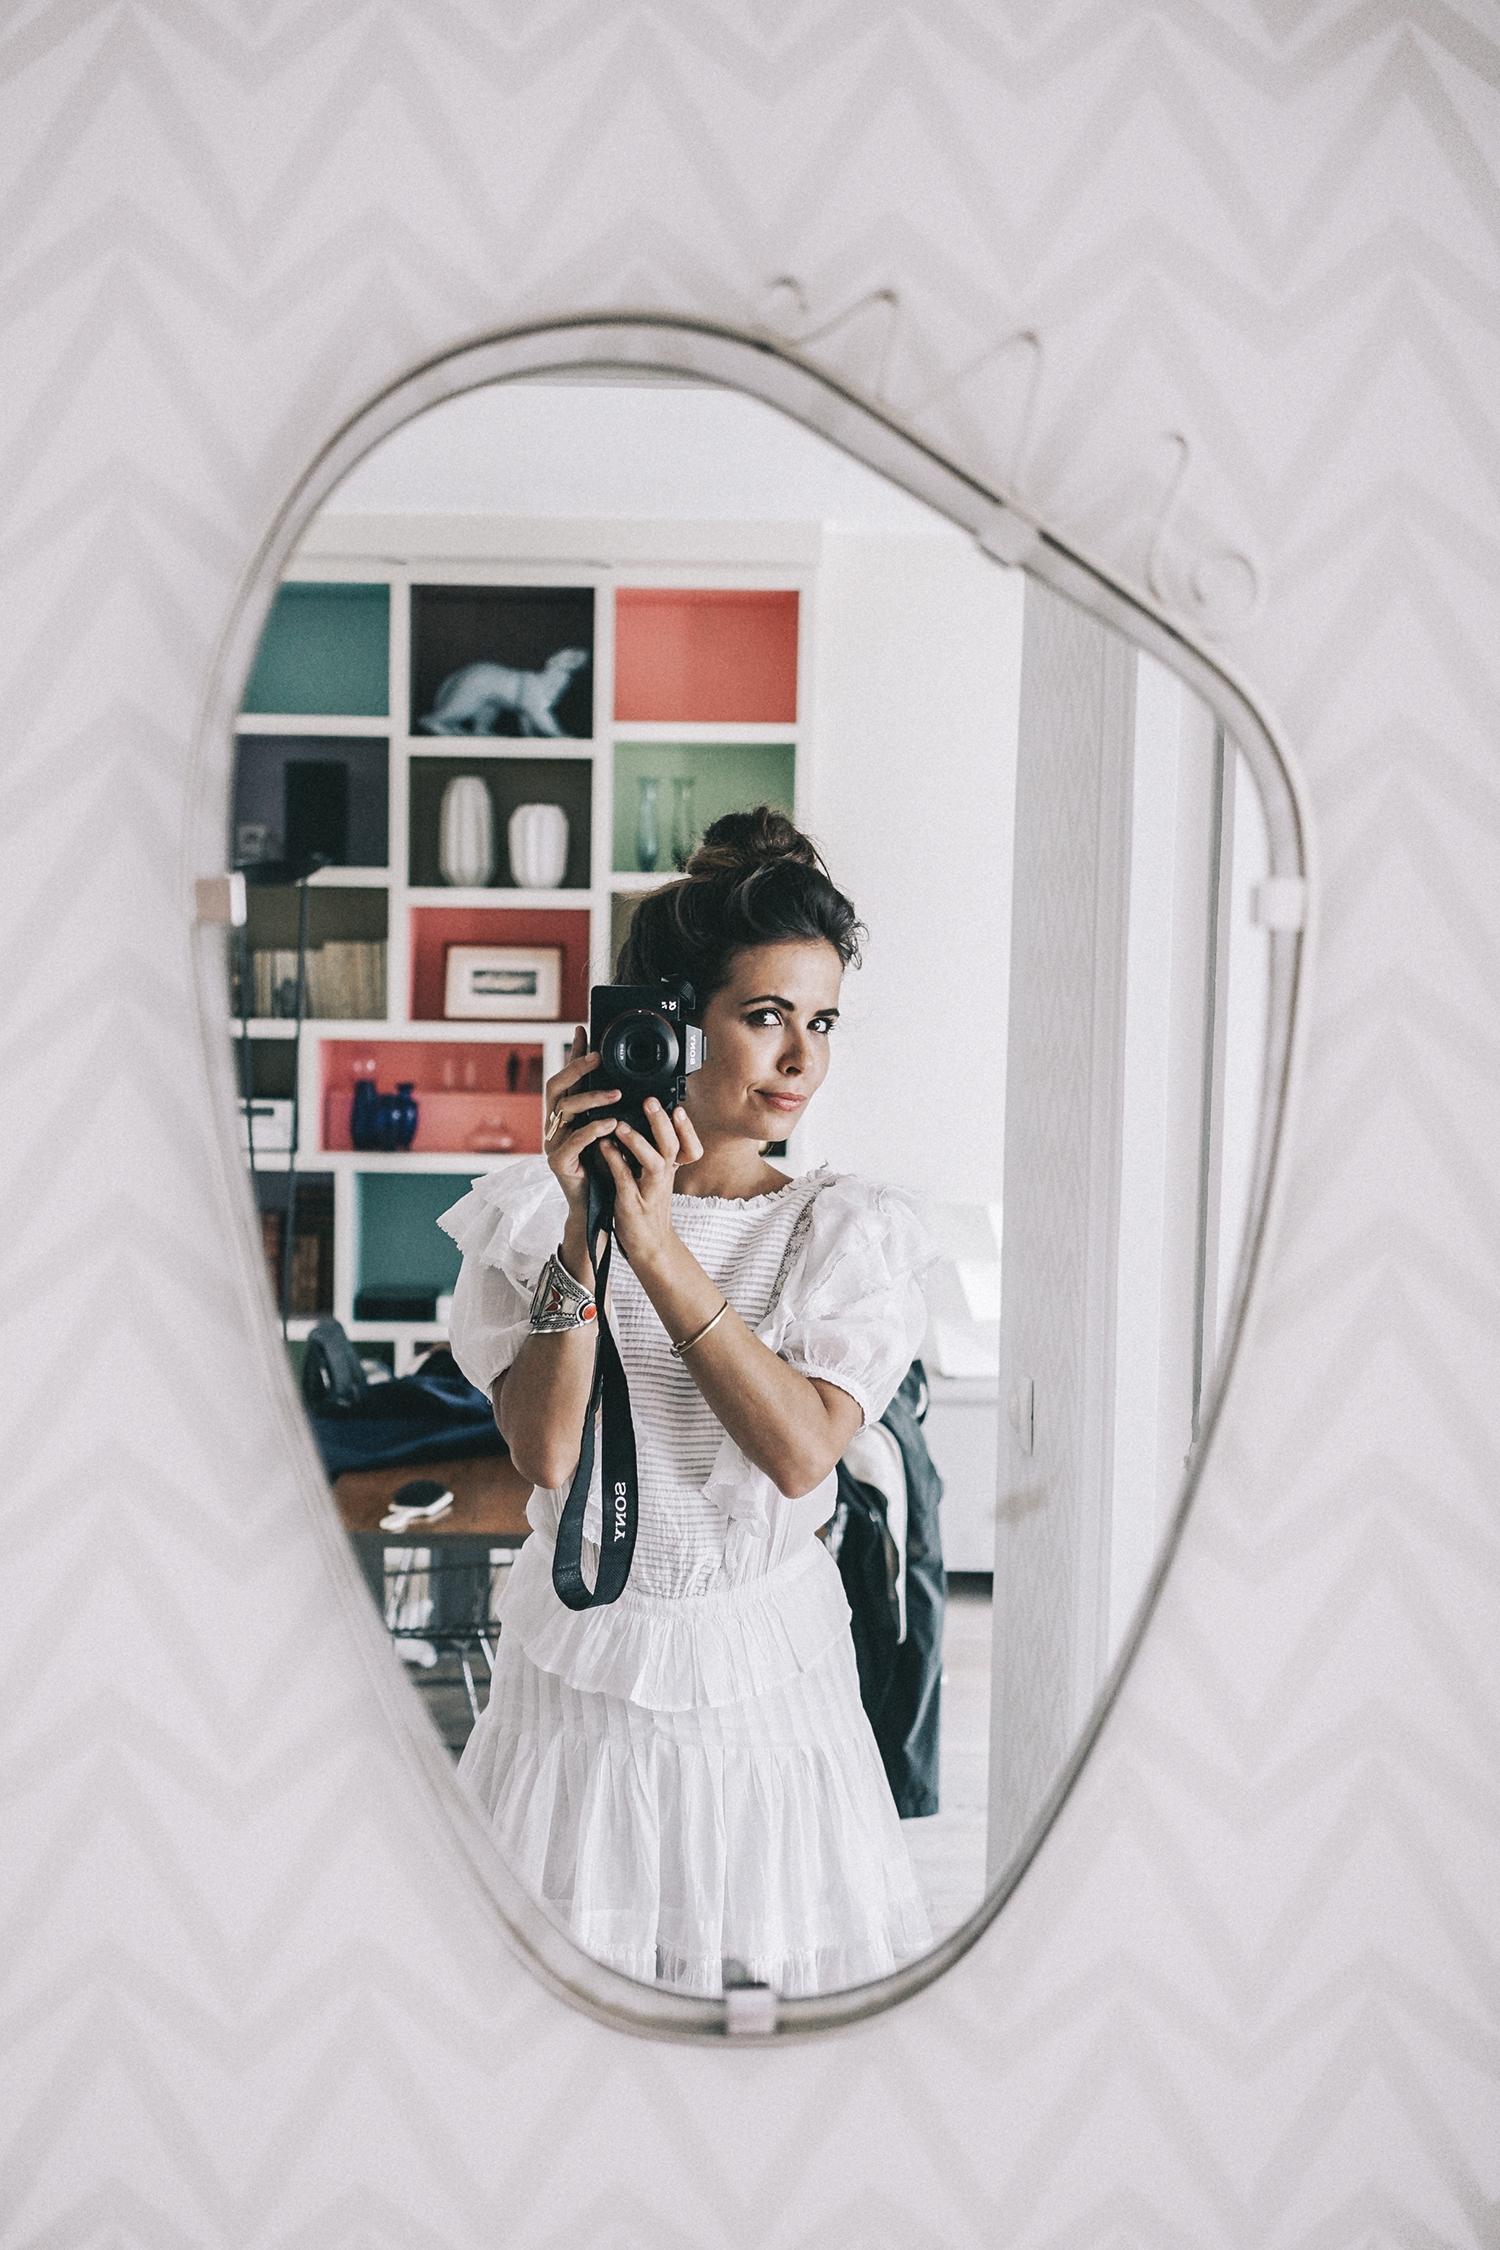 Home_Away-Isabel_Marant_Dress-Outfit-Paris-Collage_Vintage-30